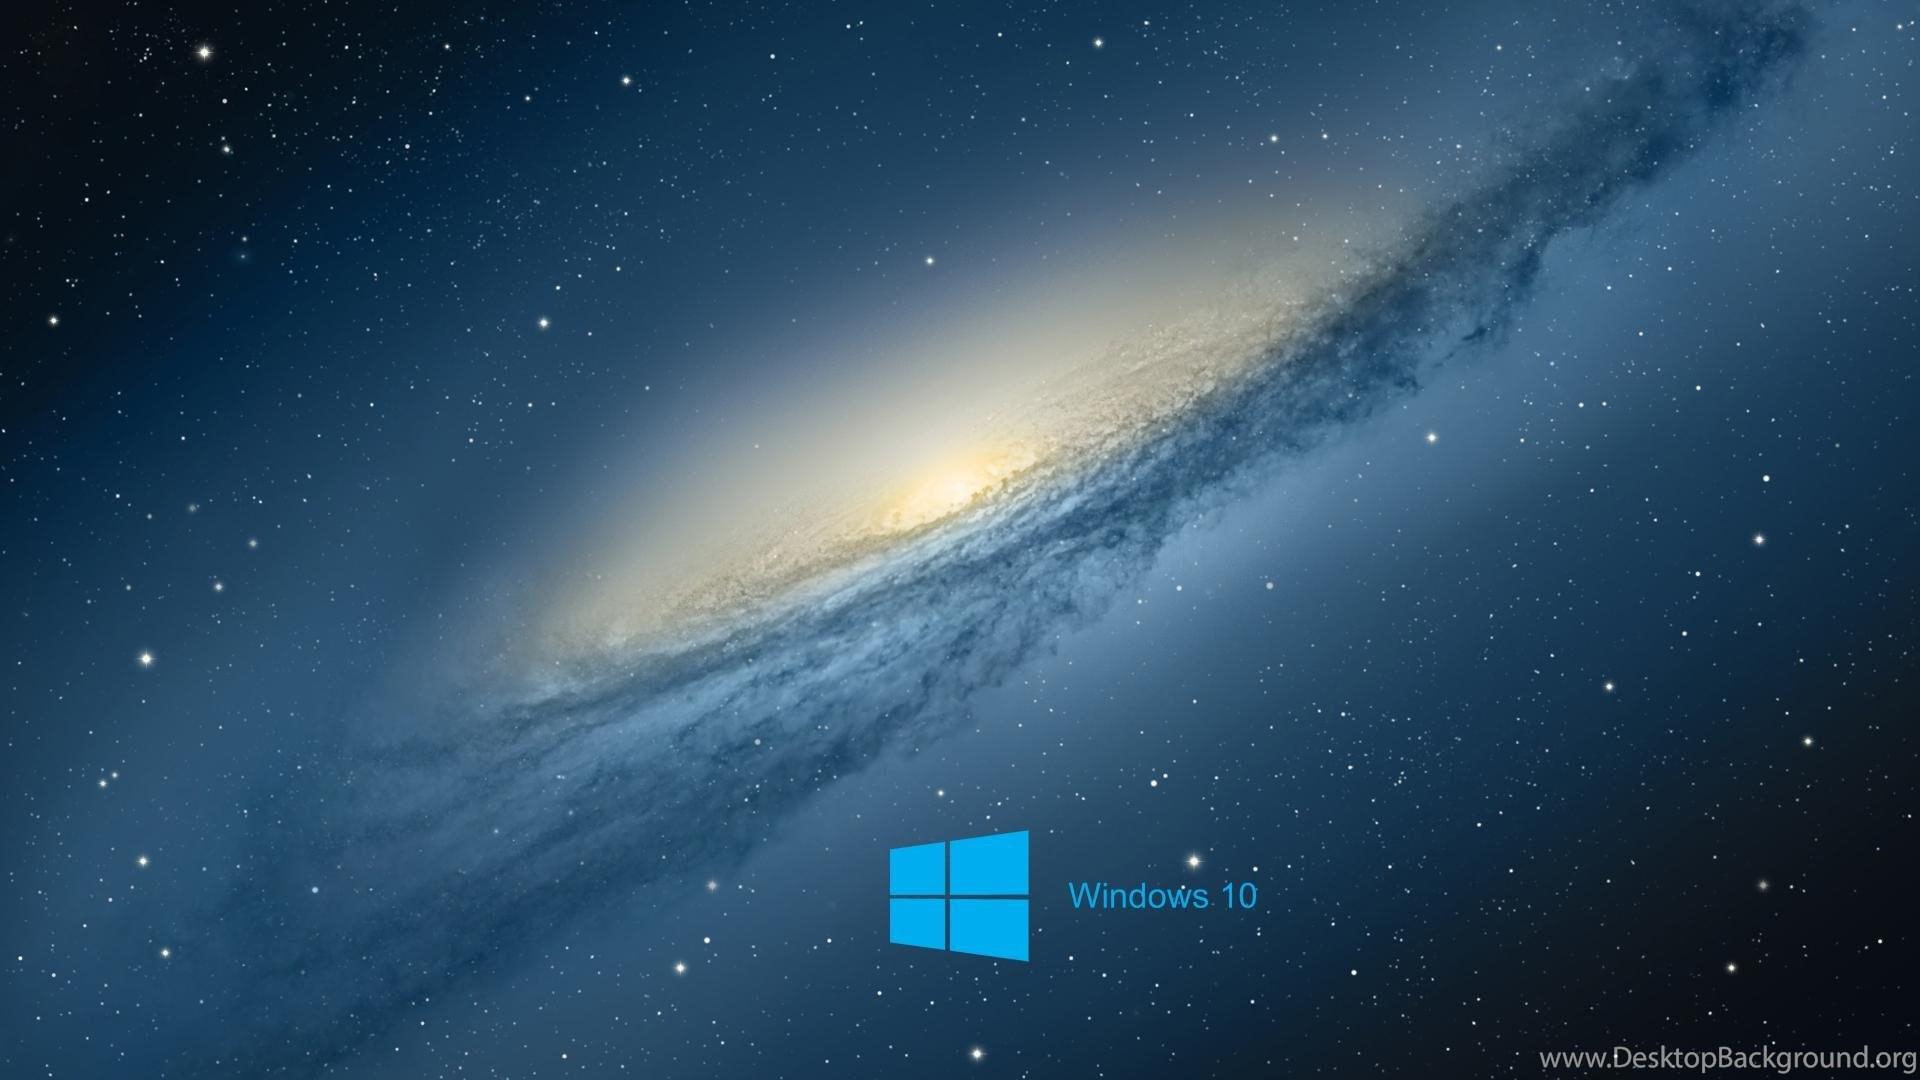 Windows 10 Desktop Backgrounds With Scientific Space